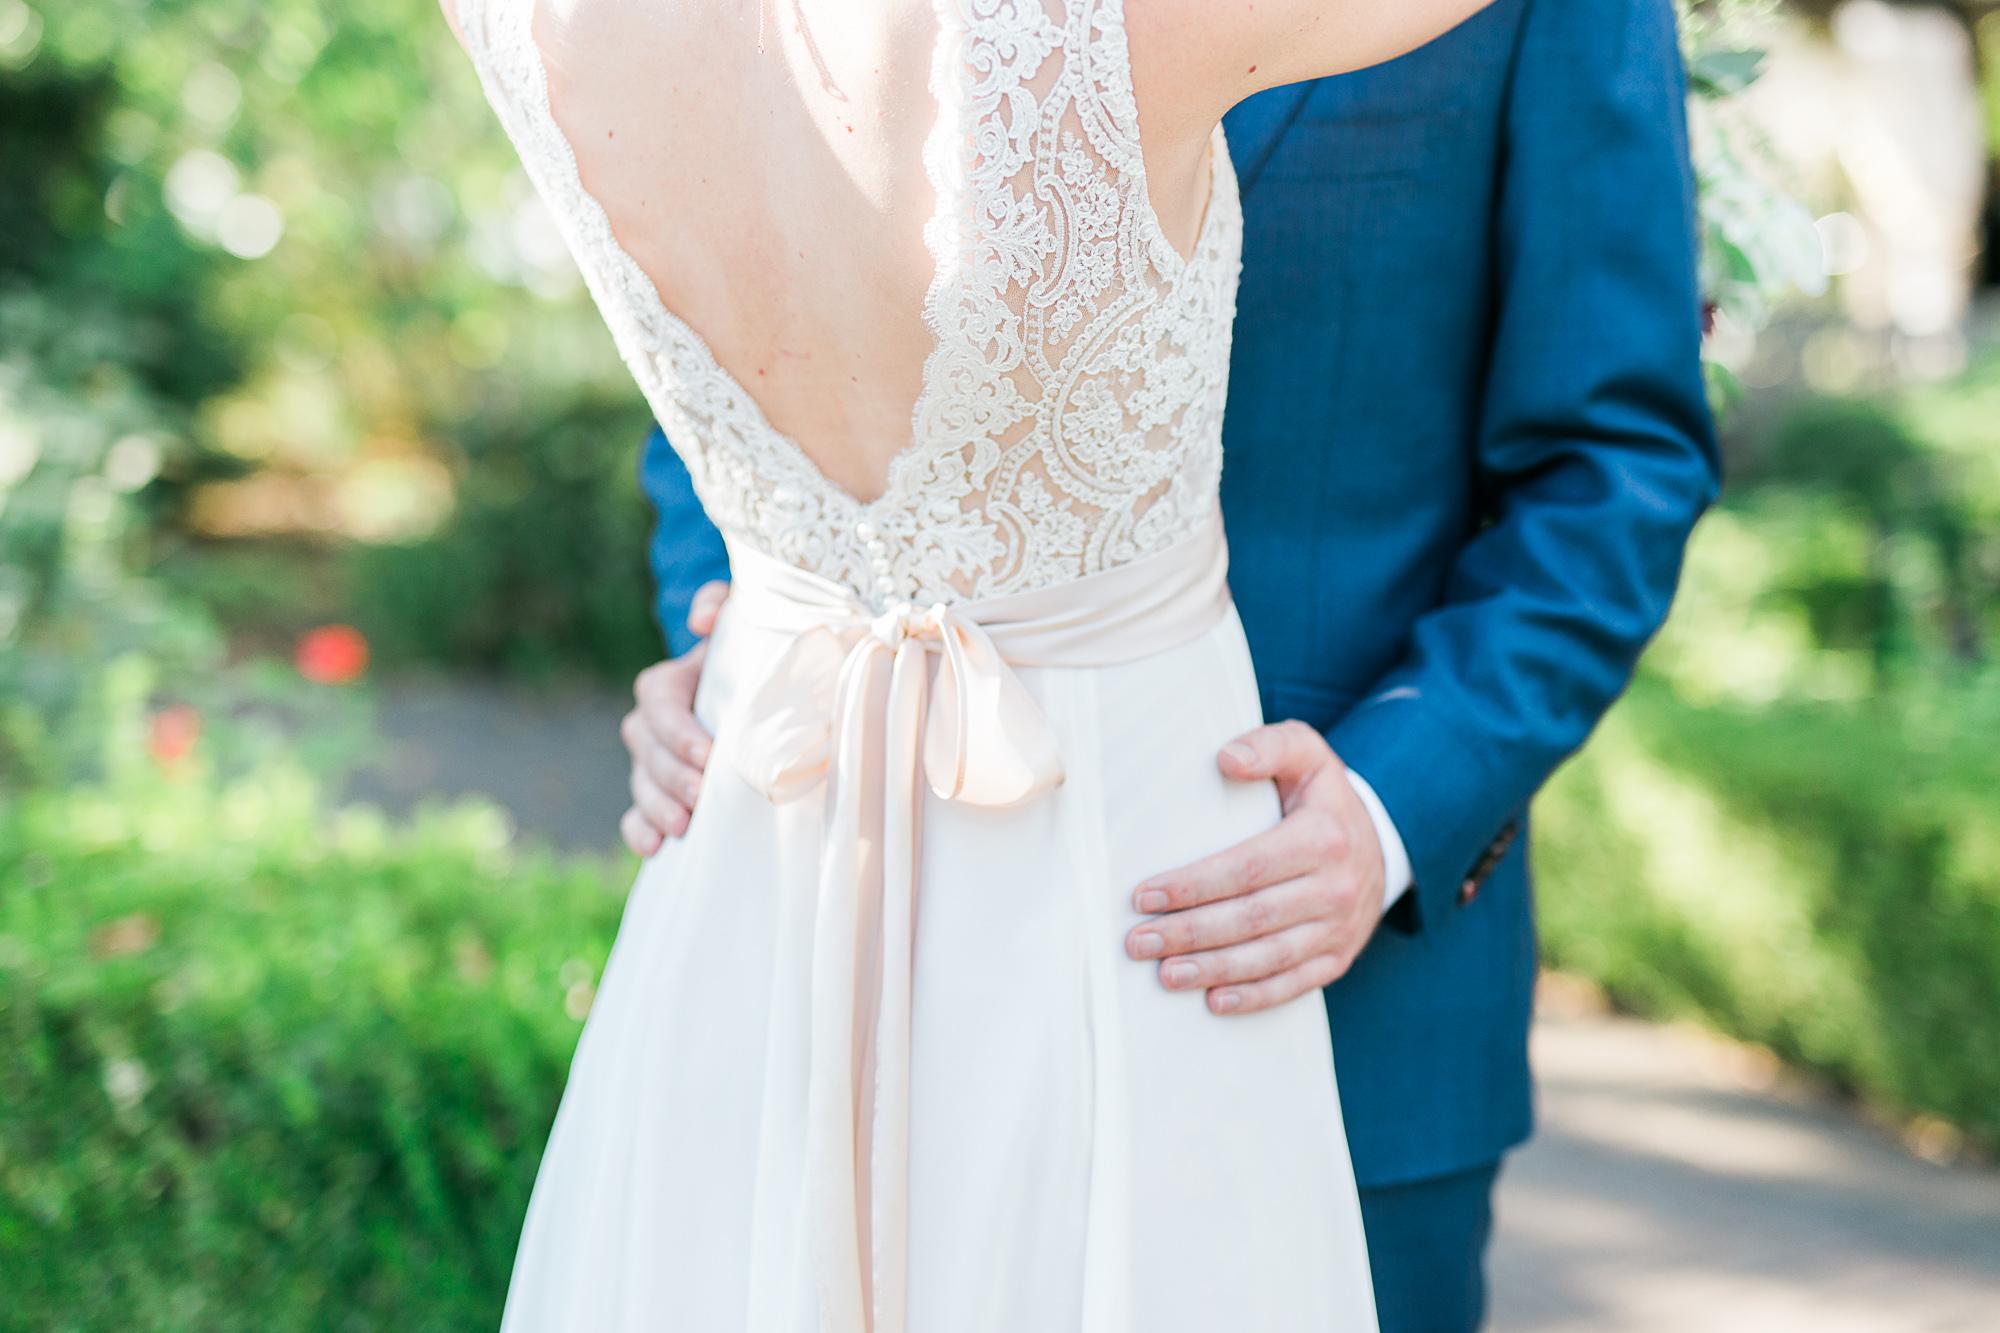 Generals Daughter Wedding Photos by JBJ Pictures - Ramekins Wedding Venue Photographer in Sonoma, Napa (15).jpg